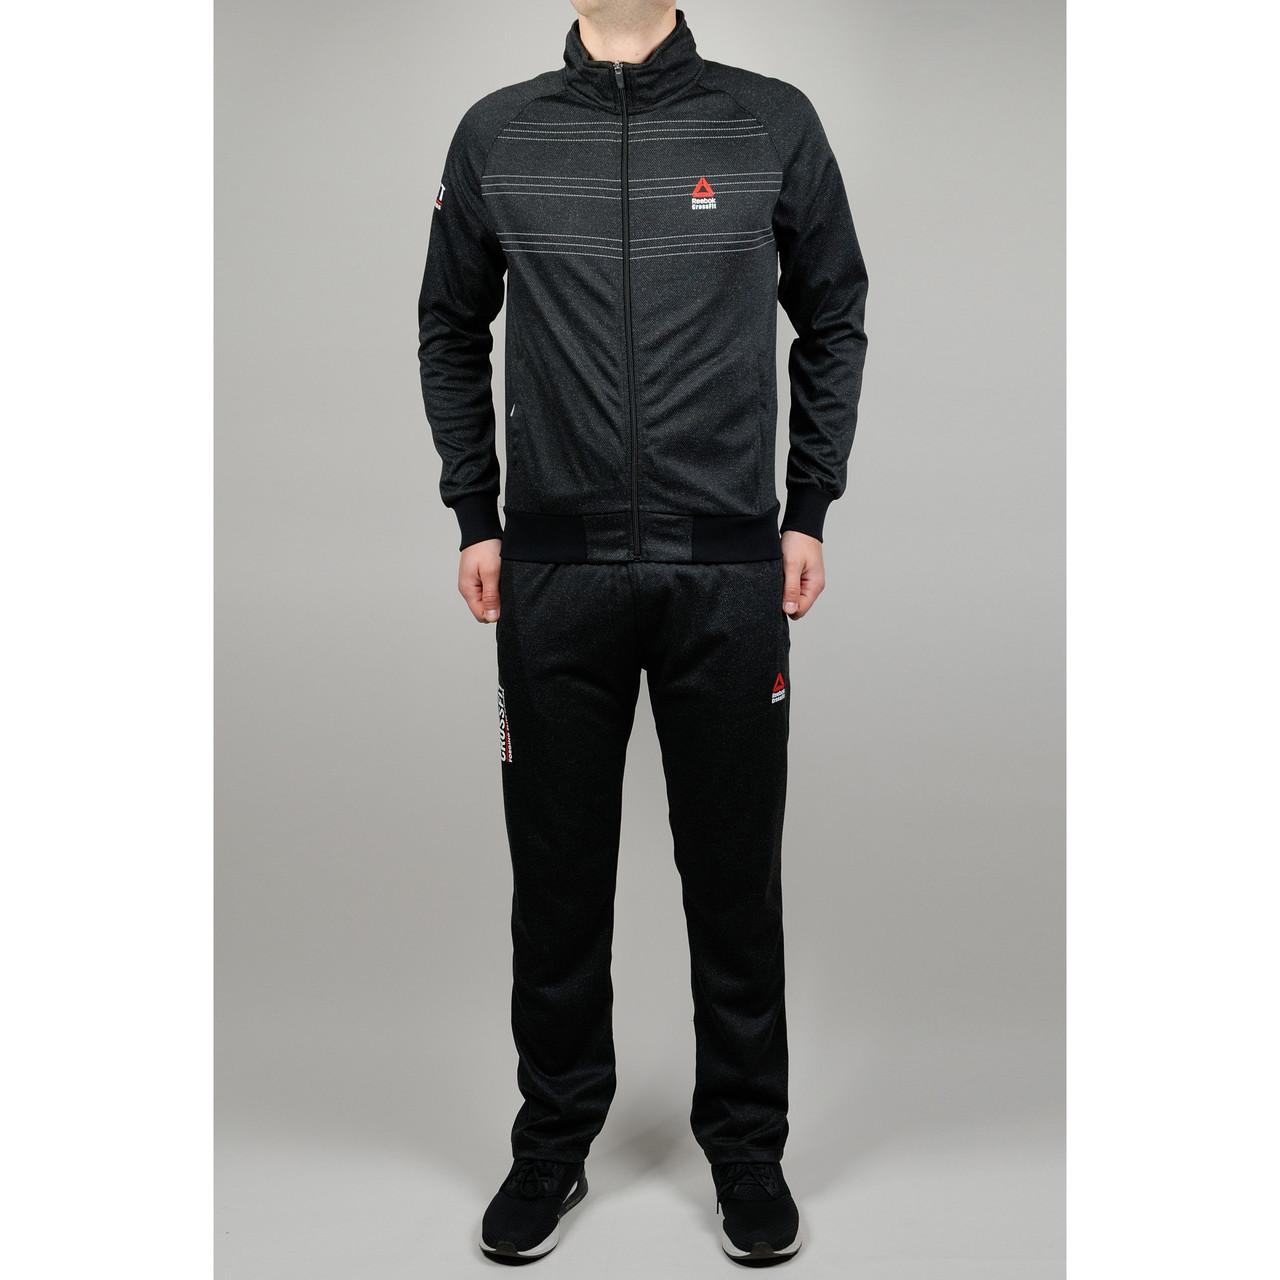 Мужской спортивный костюм Reebok Crossfit - Интернет-магазин zakyt.com -  ЗАКУТКОМ. Доставка e388c459cb6dd